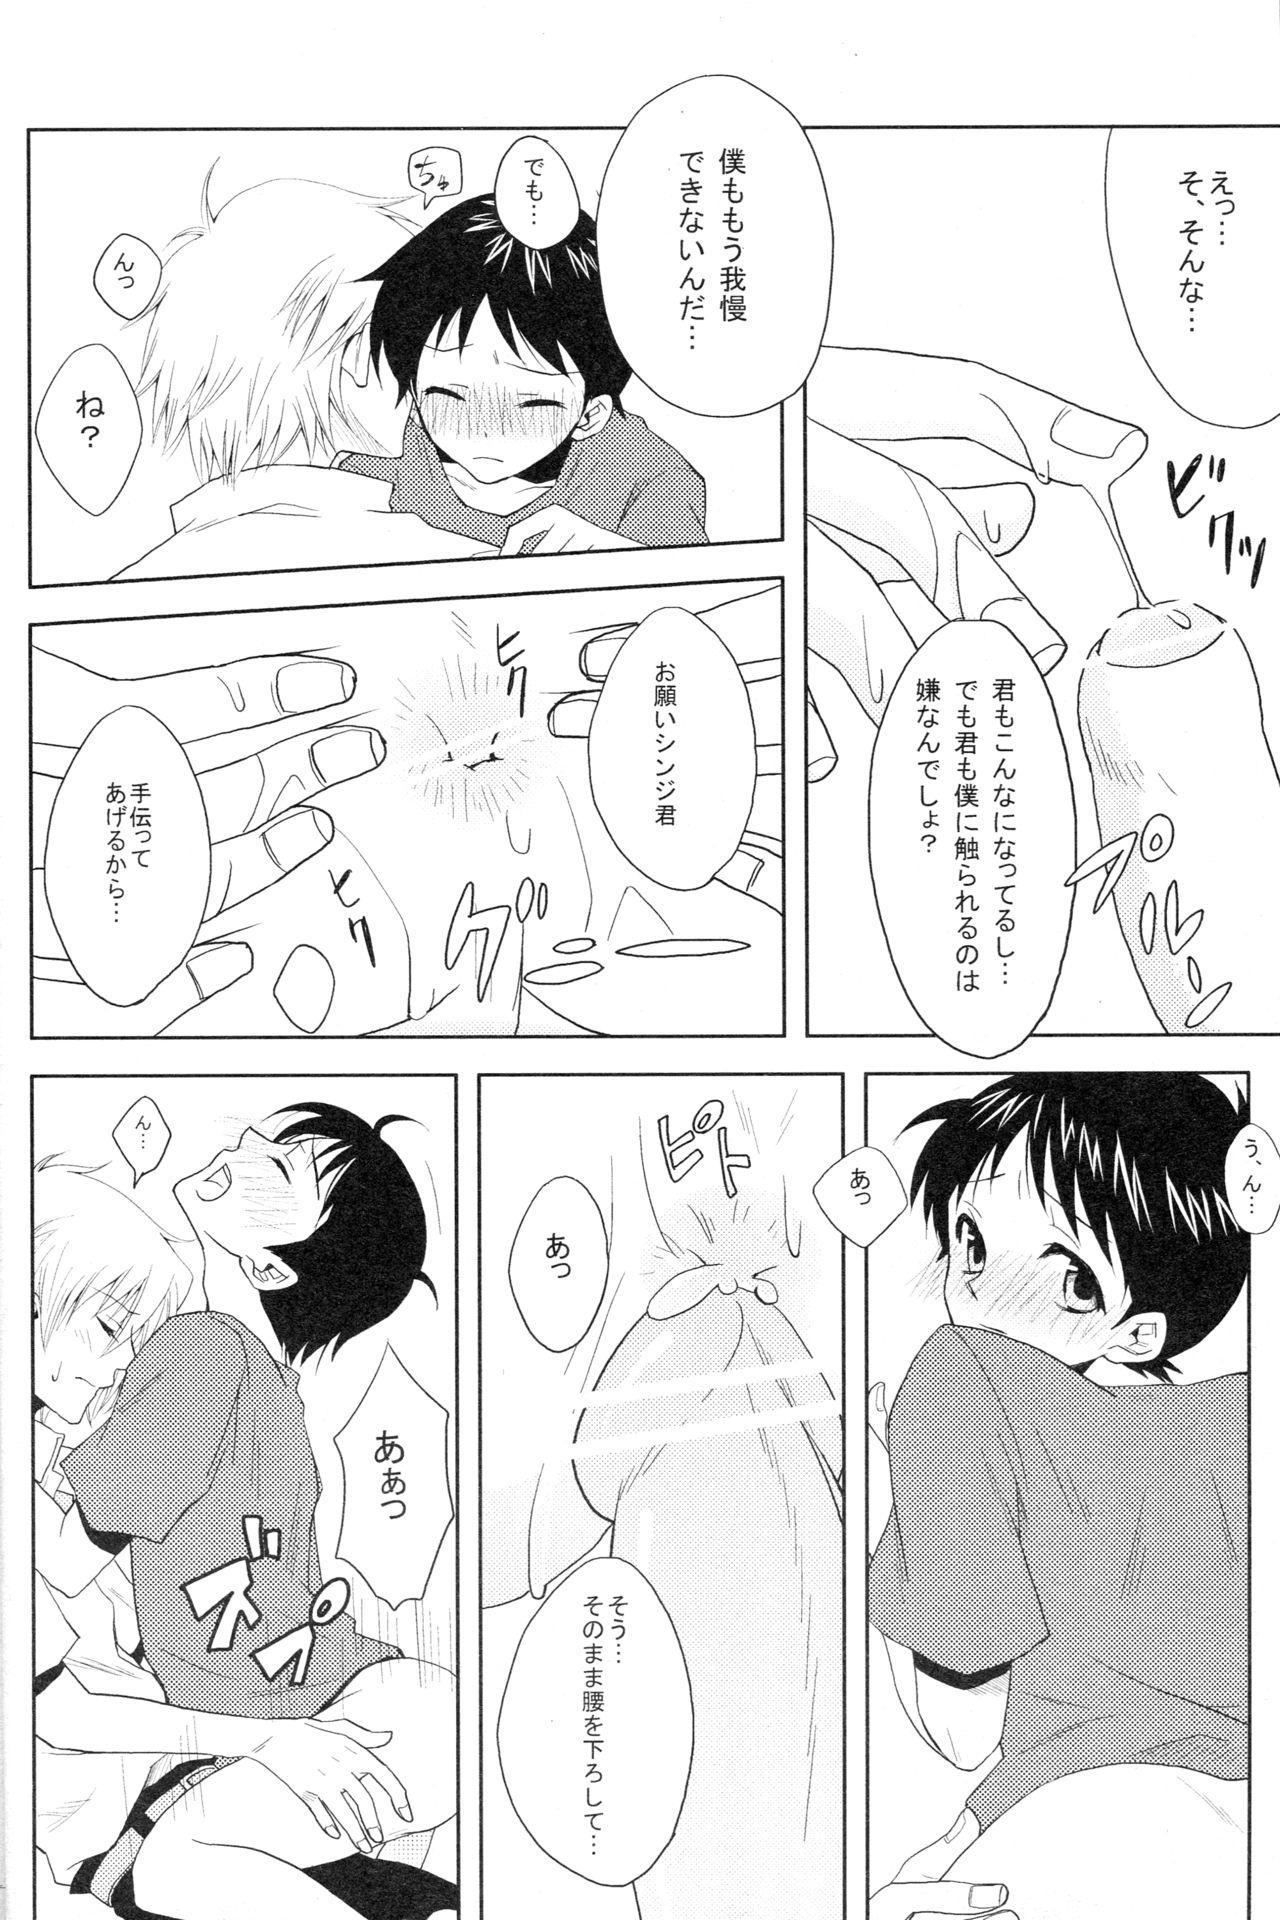 PSP Eva 2 no Susume 12